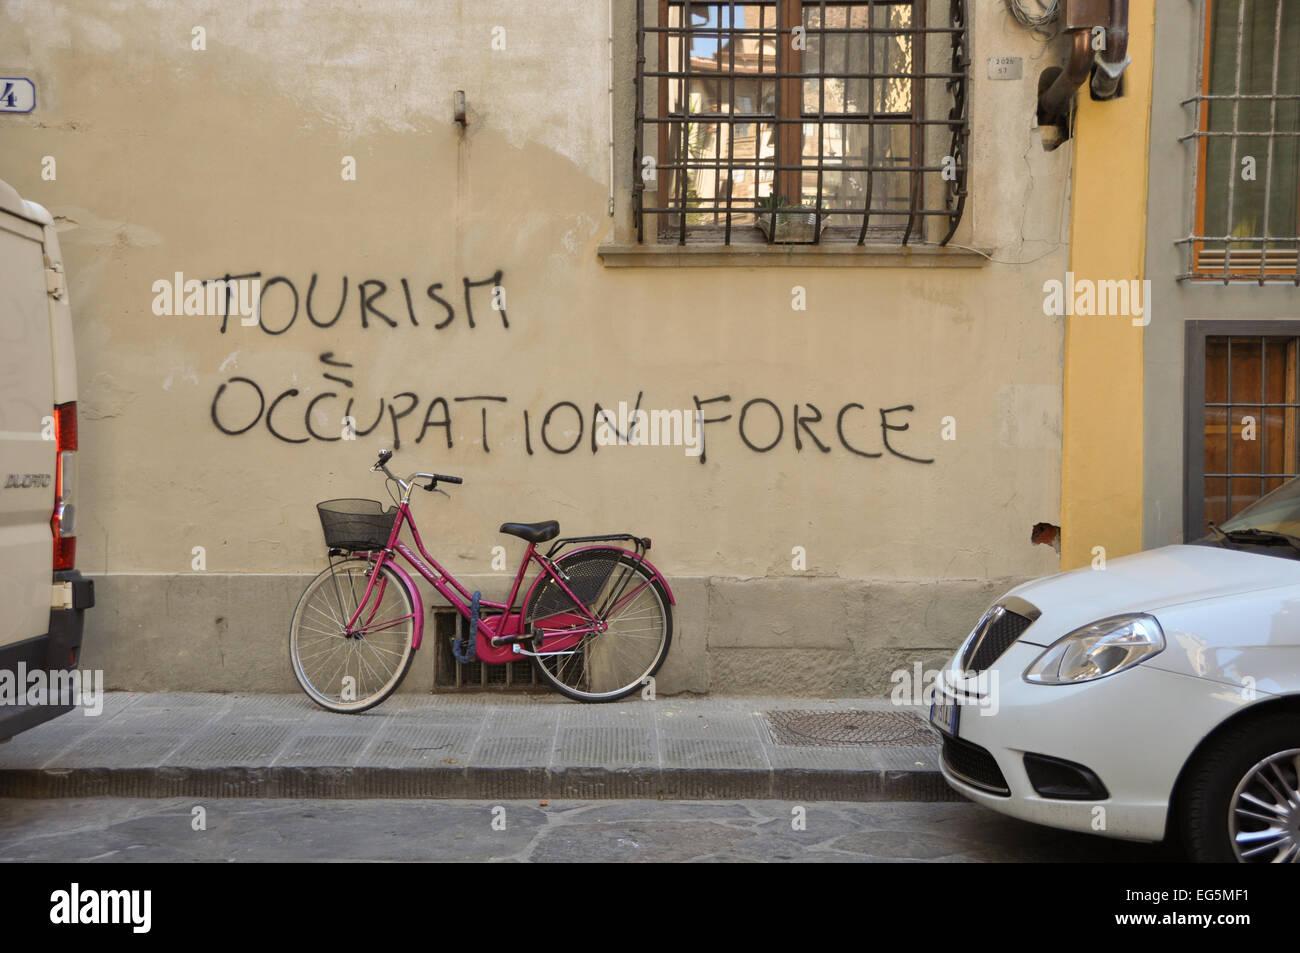 Anti-Tourismus Graffiti an der Wand in Florenz über rosa Bike - Italien Stockbild